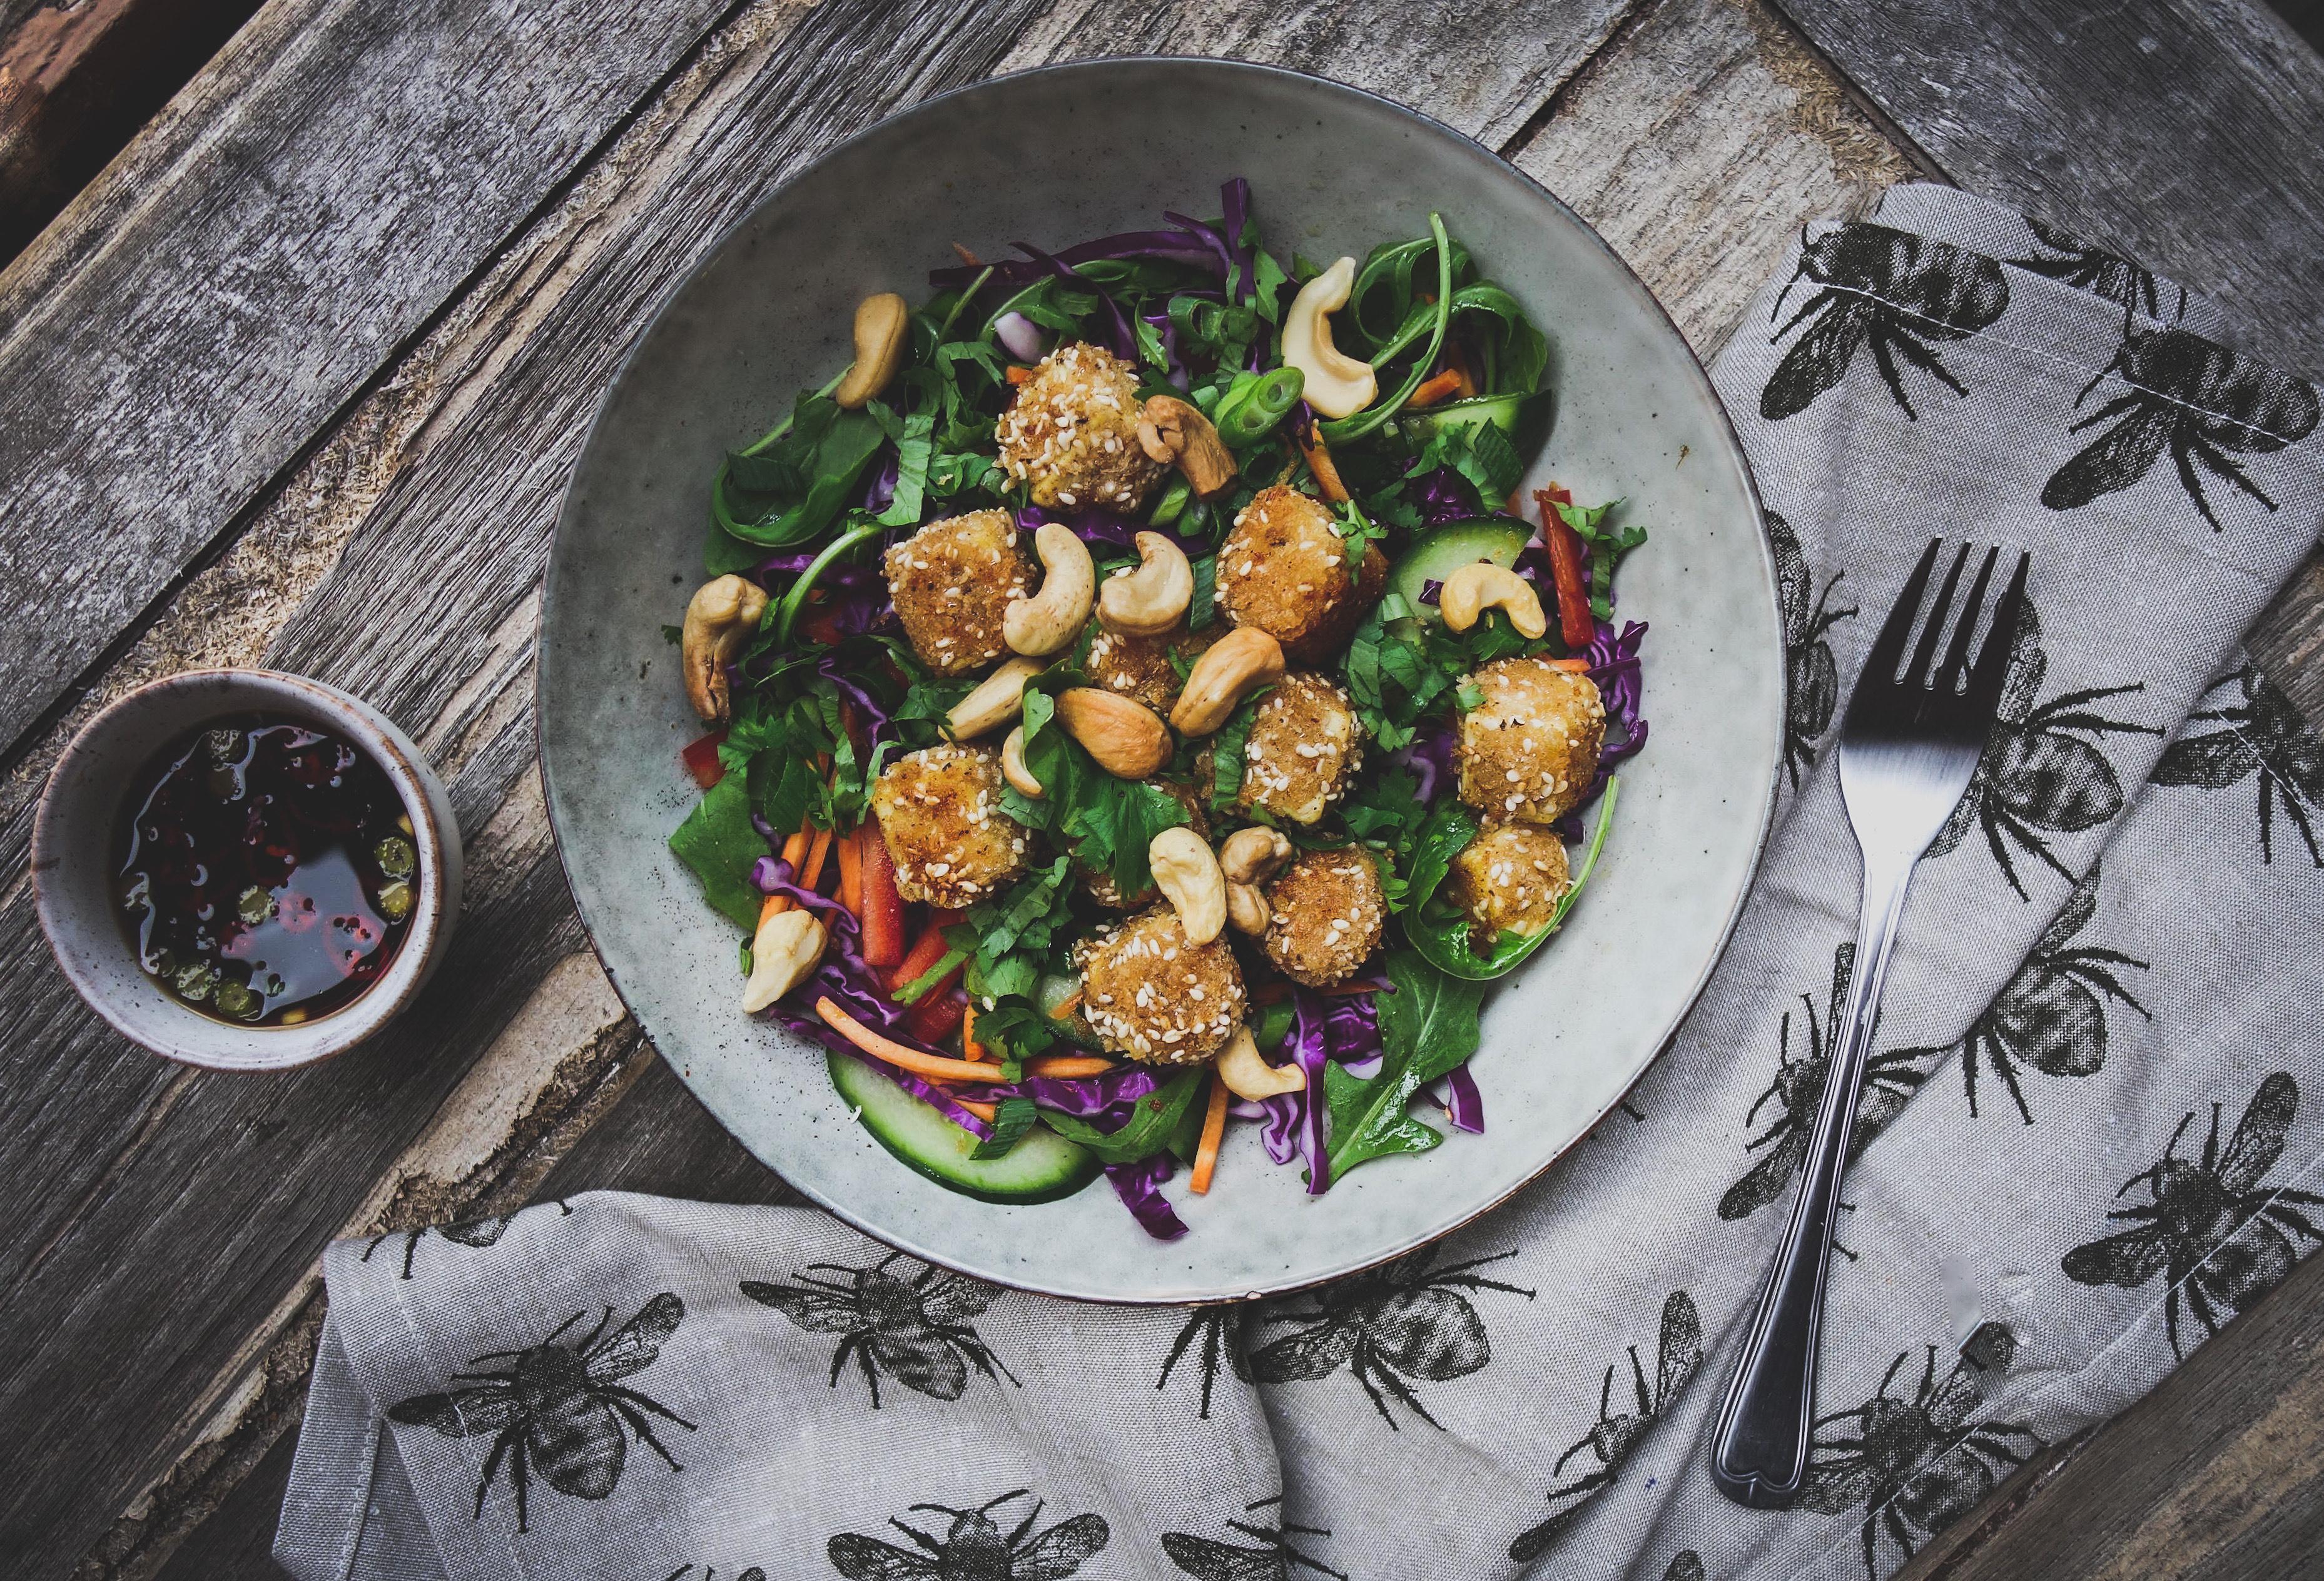 Vegan Vietnamese Rainbow Salad With Sesame Crusted Tofu